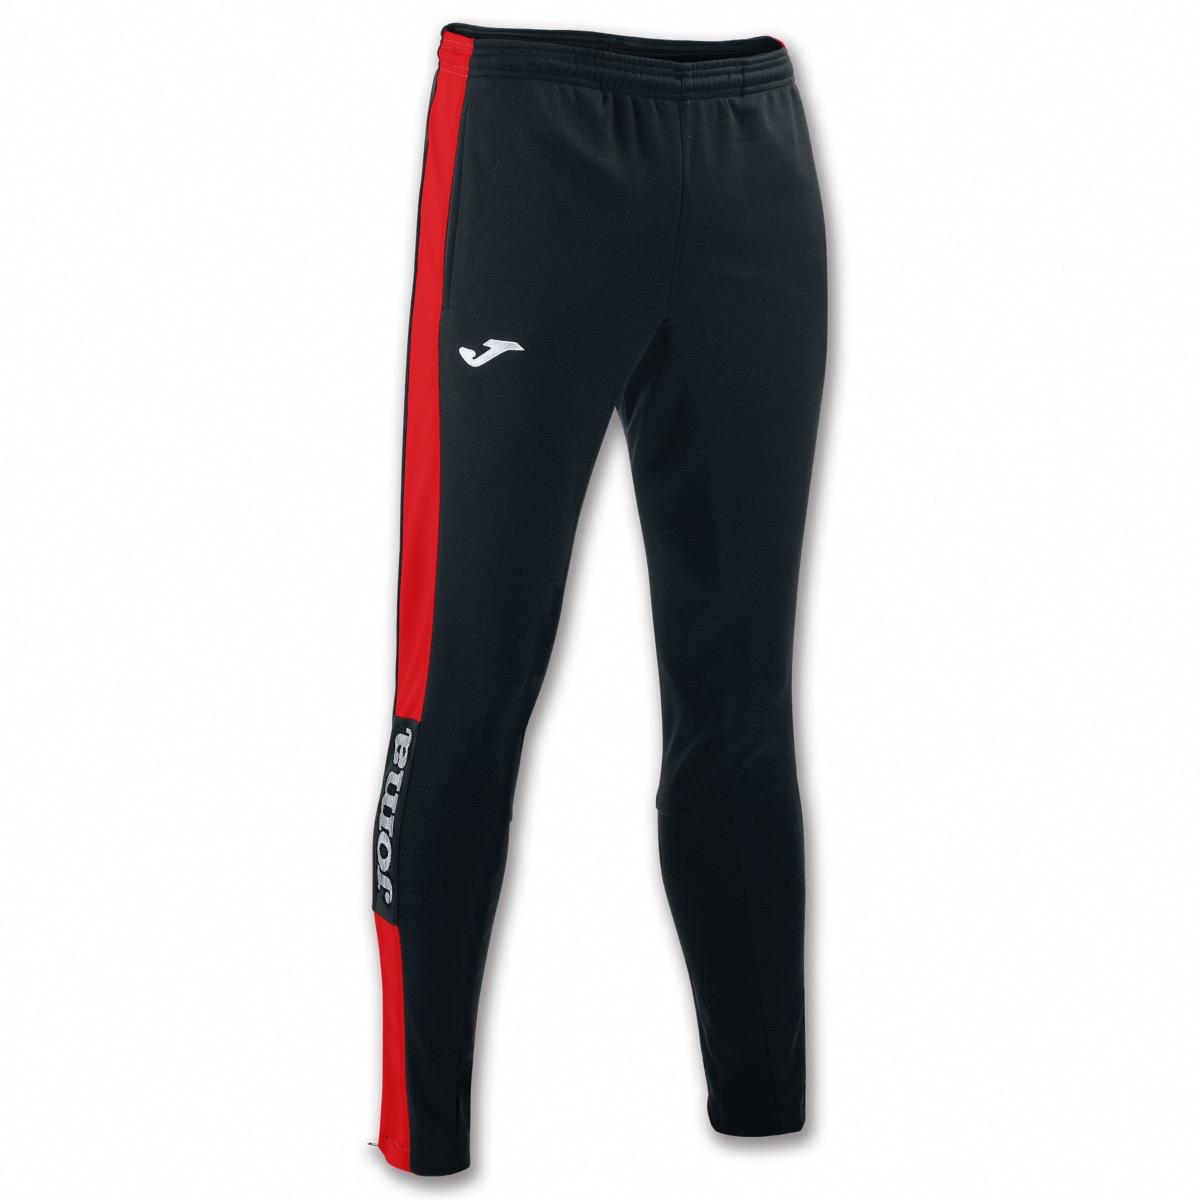 Champion Jogging De Iv Pantalon Recupsports Joma ZqIP4